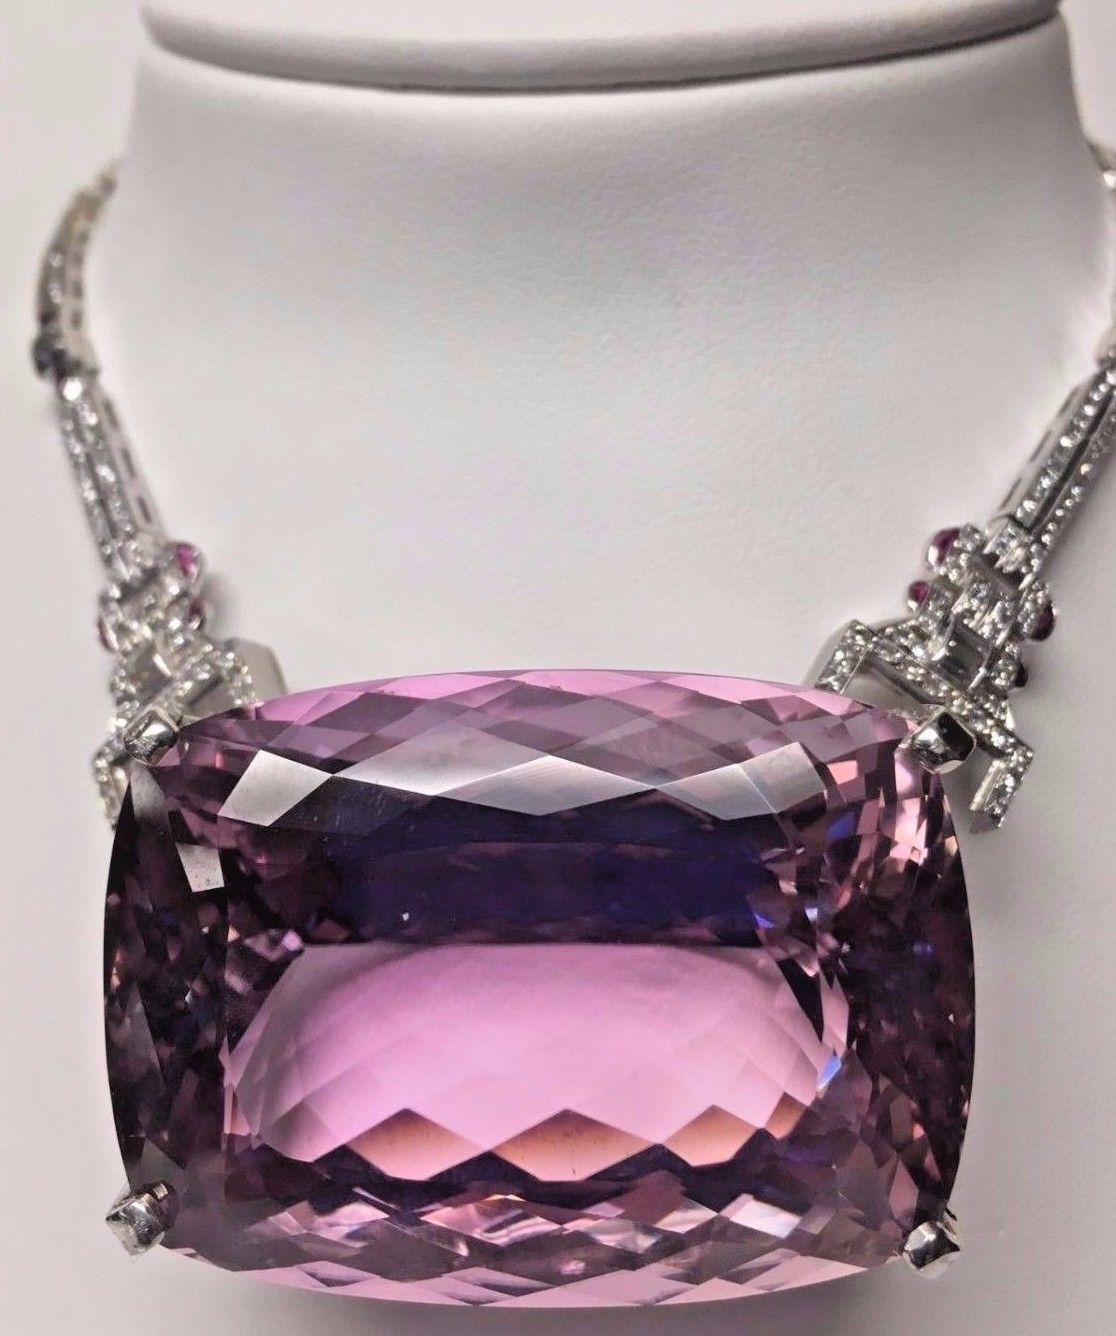 New Huge Custom designer Flawless 284ct Kunzite diamond Platinum necklace Choker